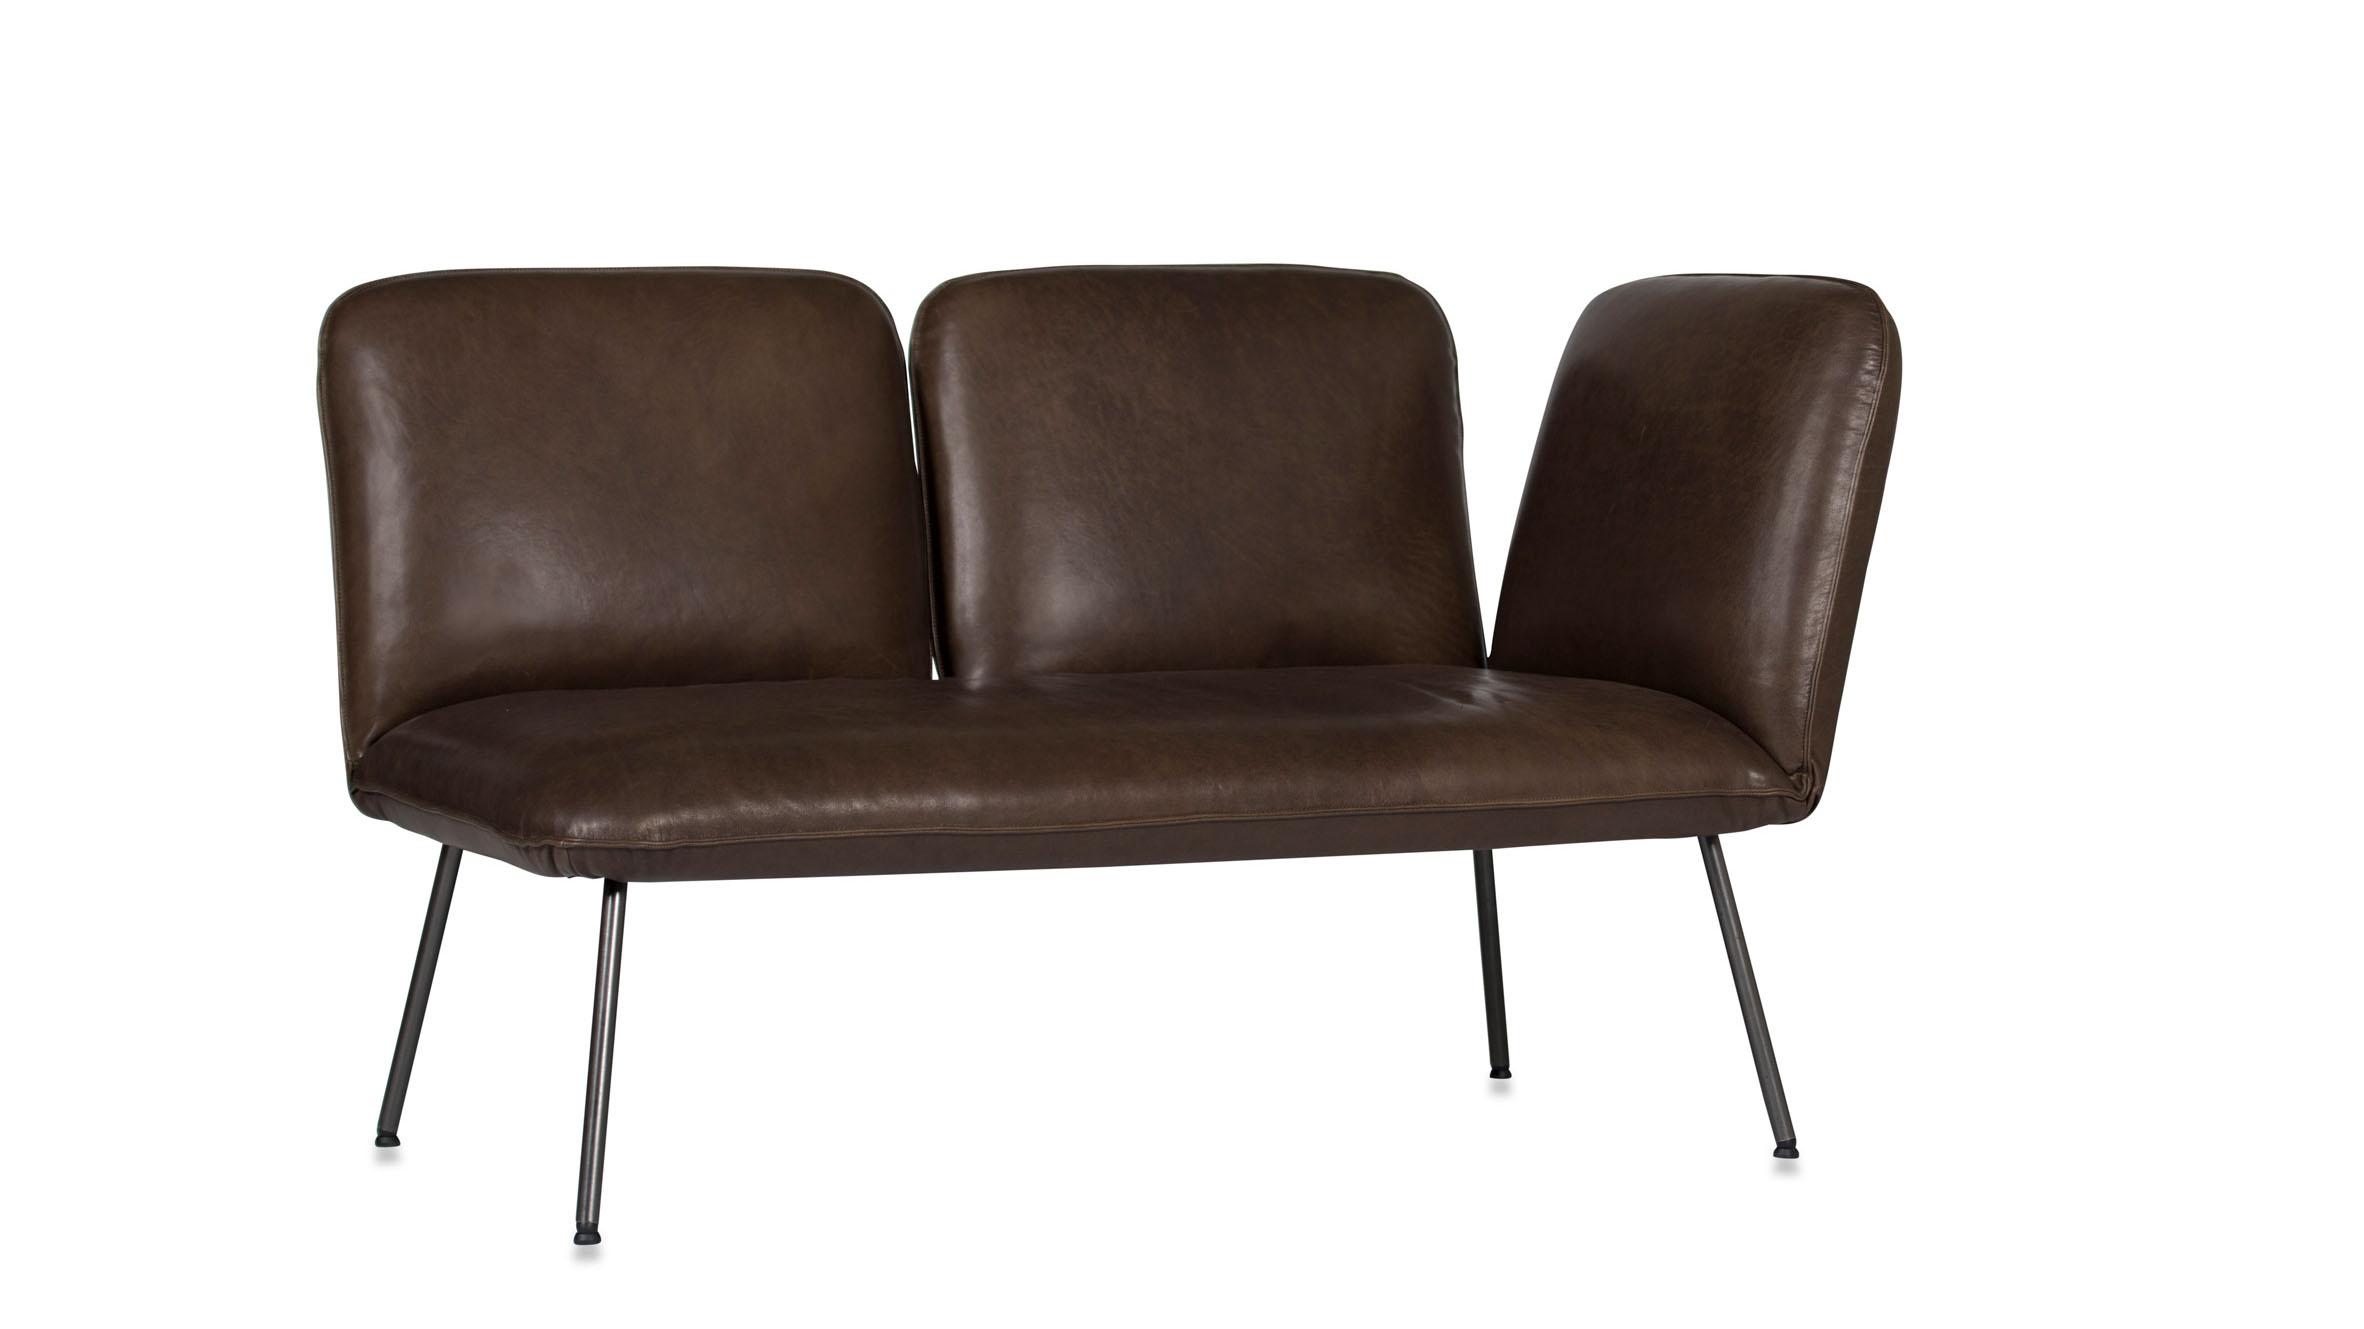 Shuffle sofa in brown leather